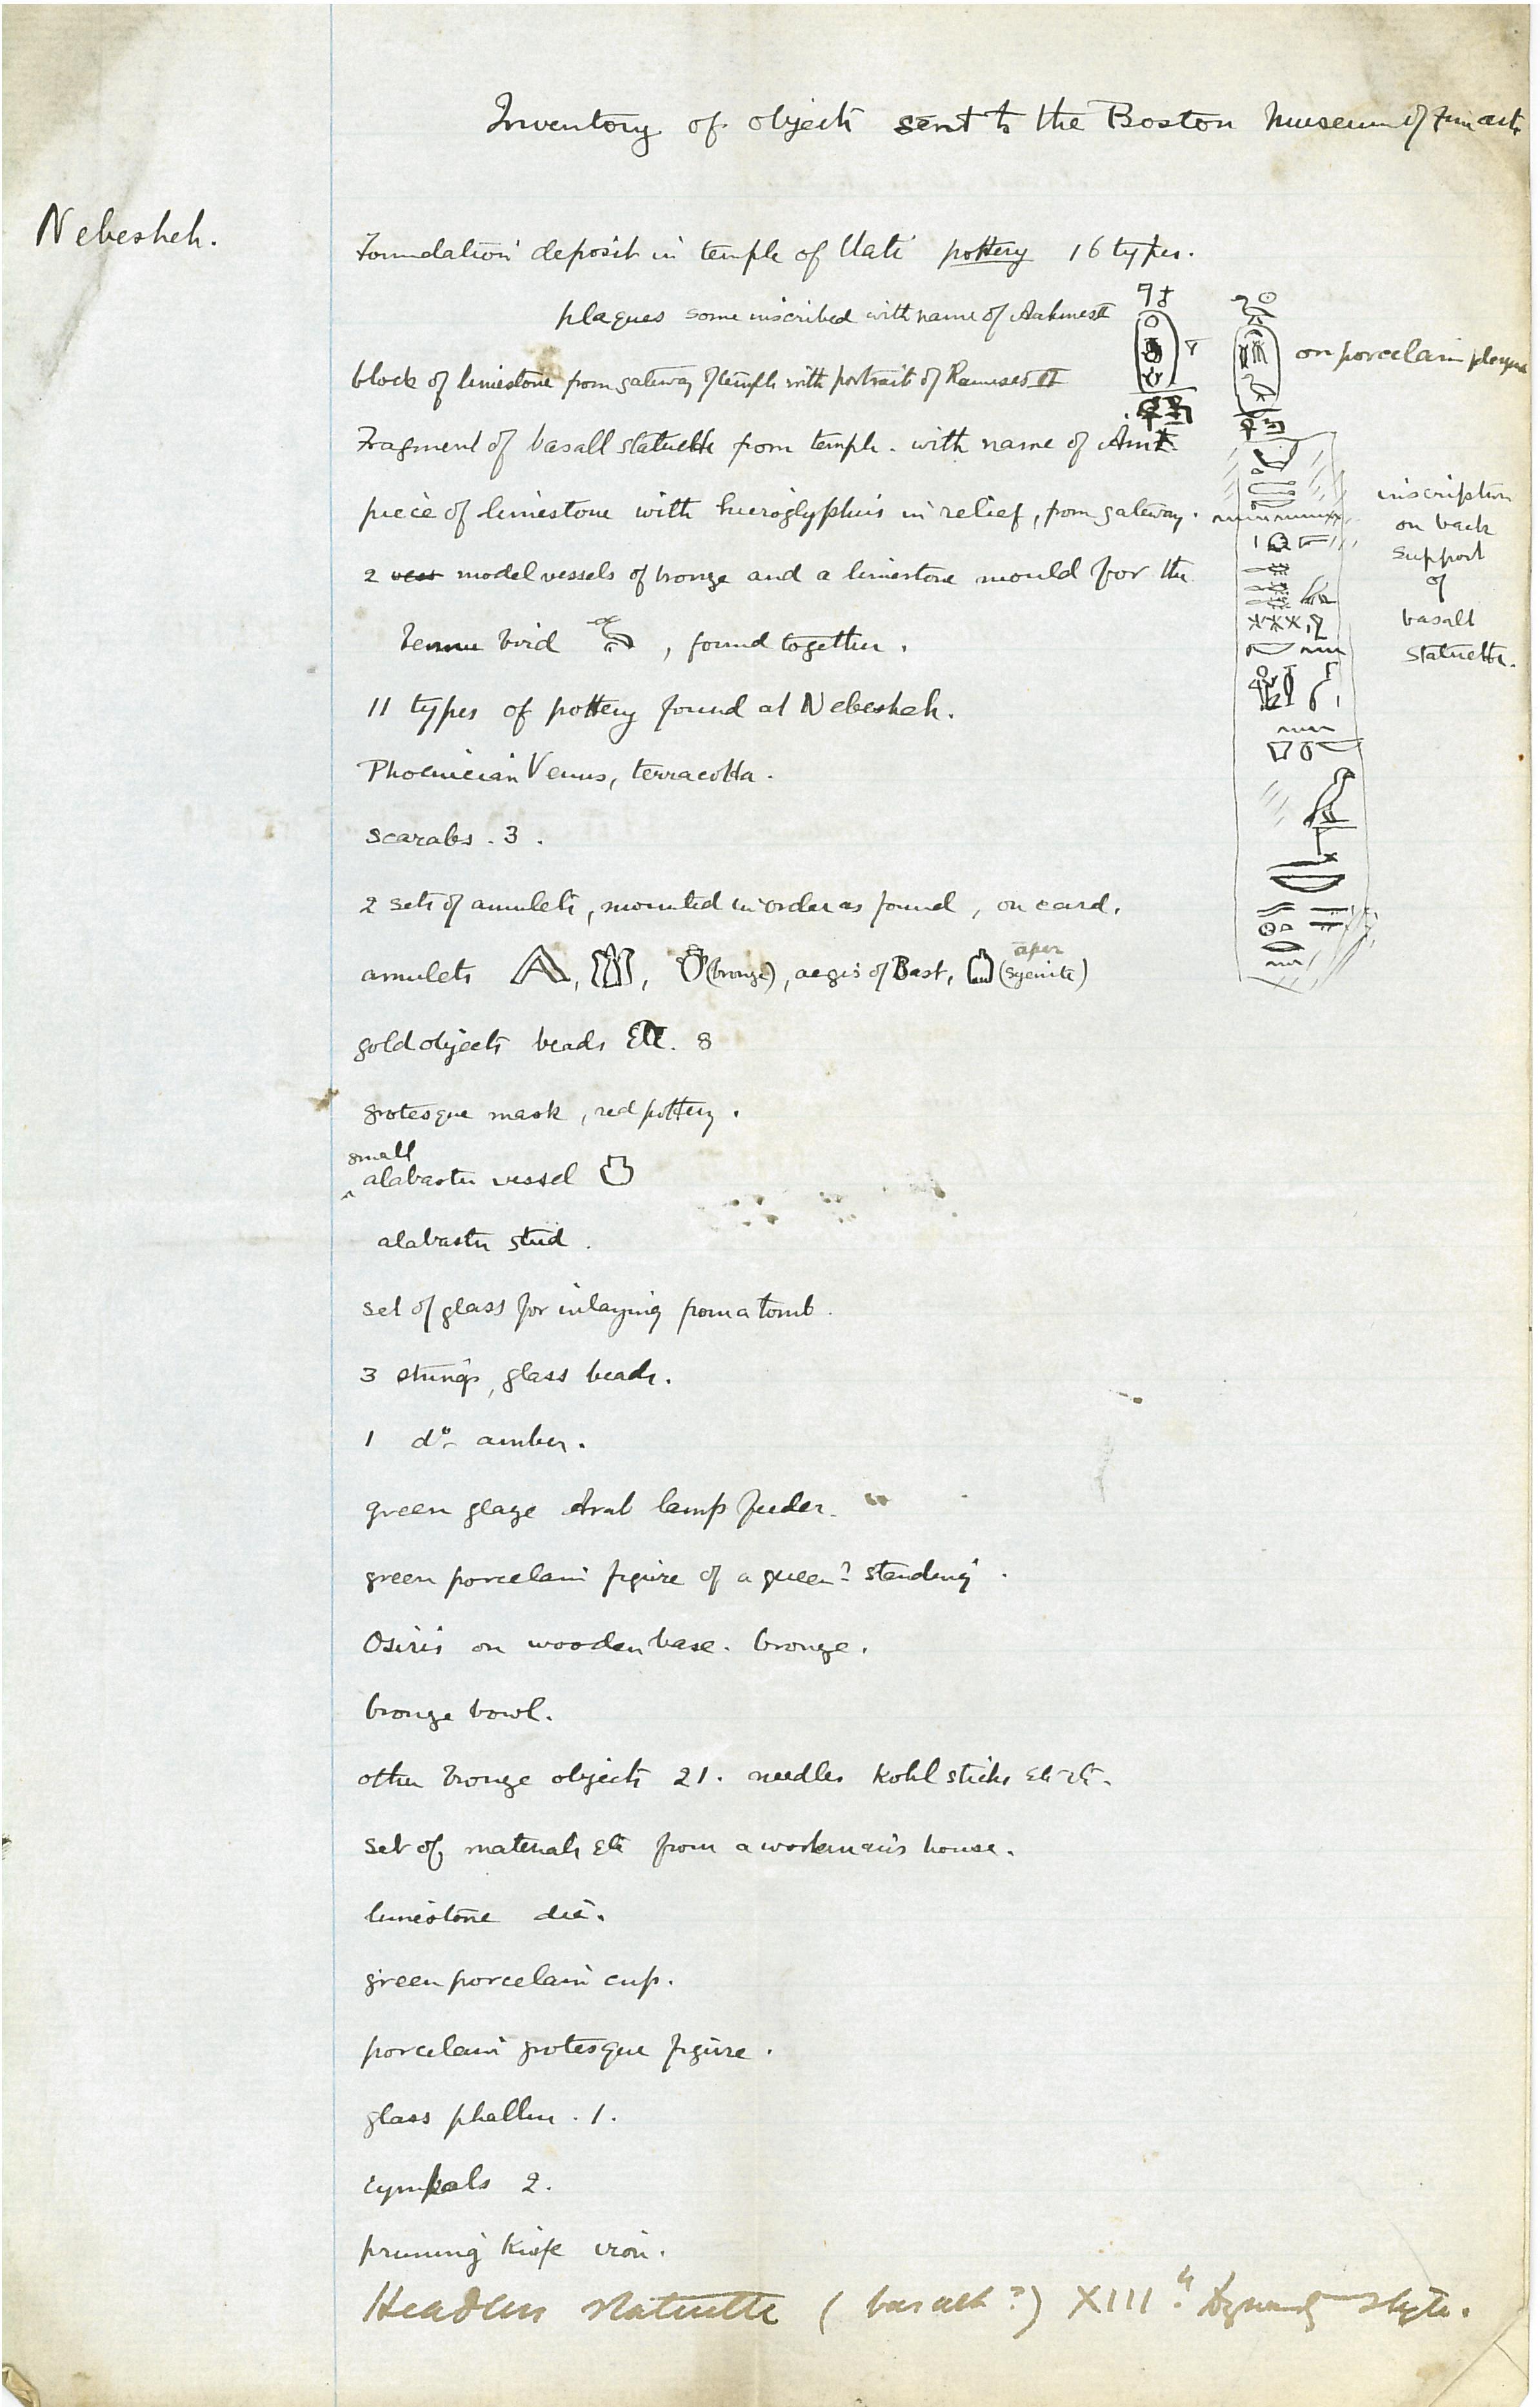 1886 Nebesheh Tell Dafana 1884 el-Qantara, Tell Gemayemi, Tell Sueilin DIST.09.04d